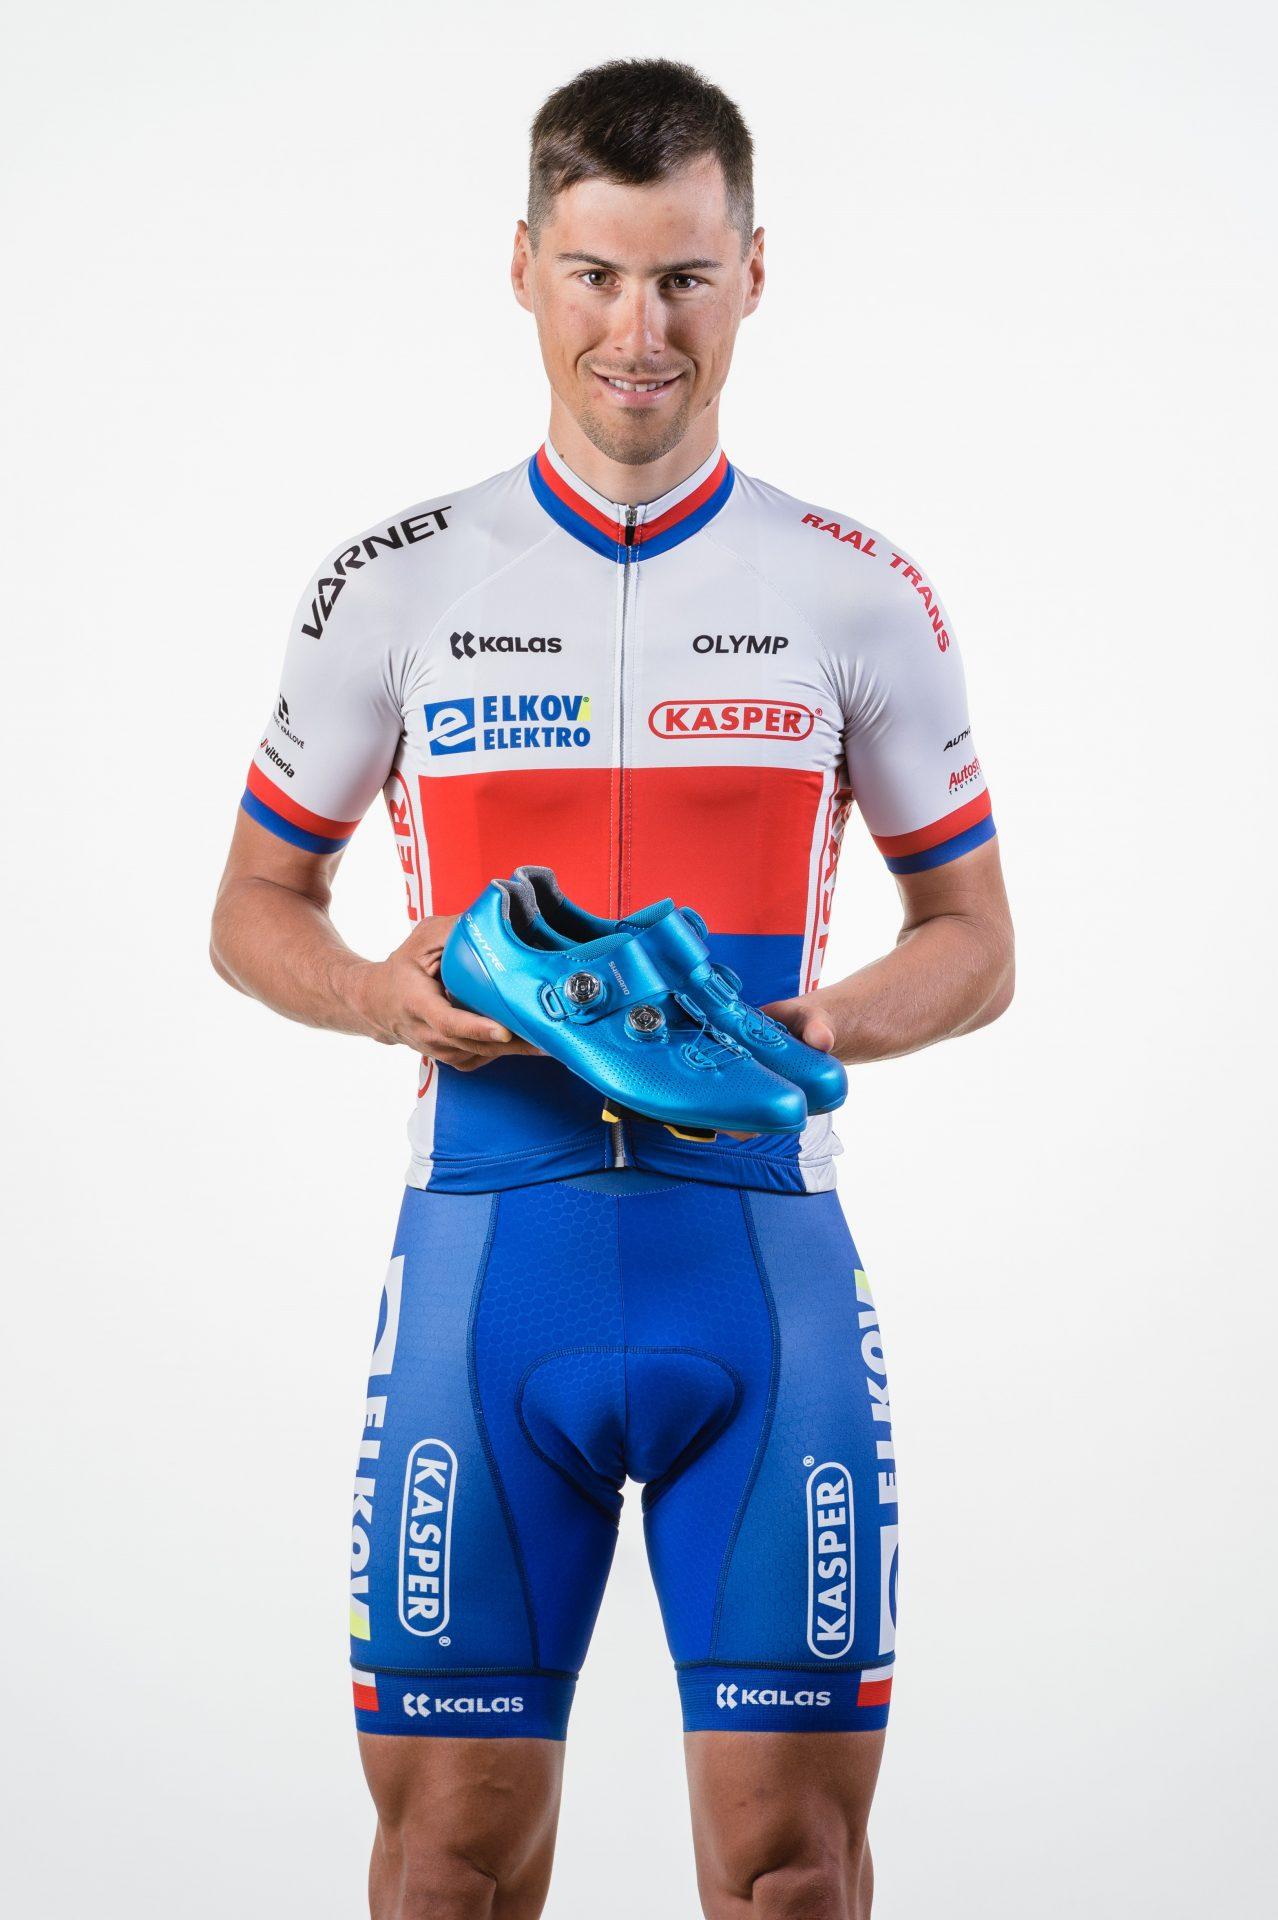 František Sisr v dresu českého cyklistického šampiona. Foto Jan Brychta/Elkov Kasper